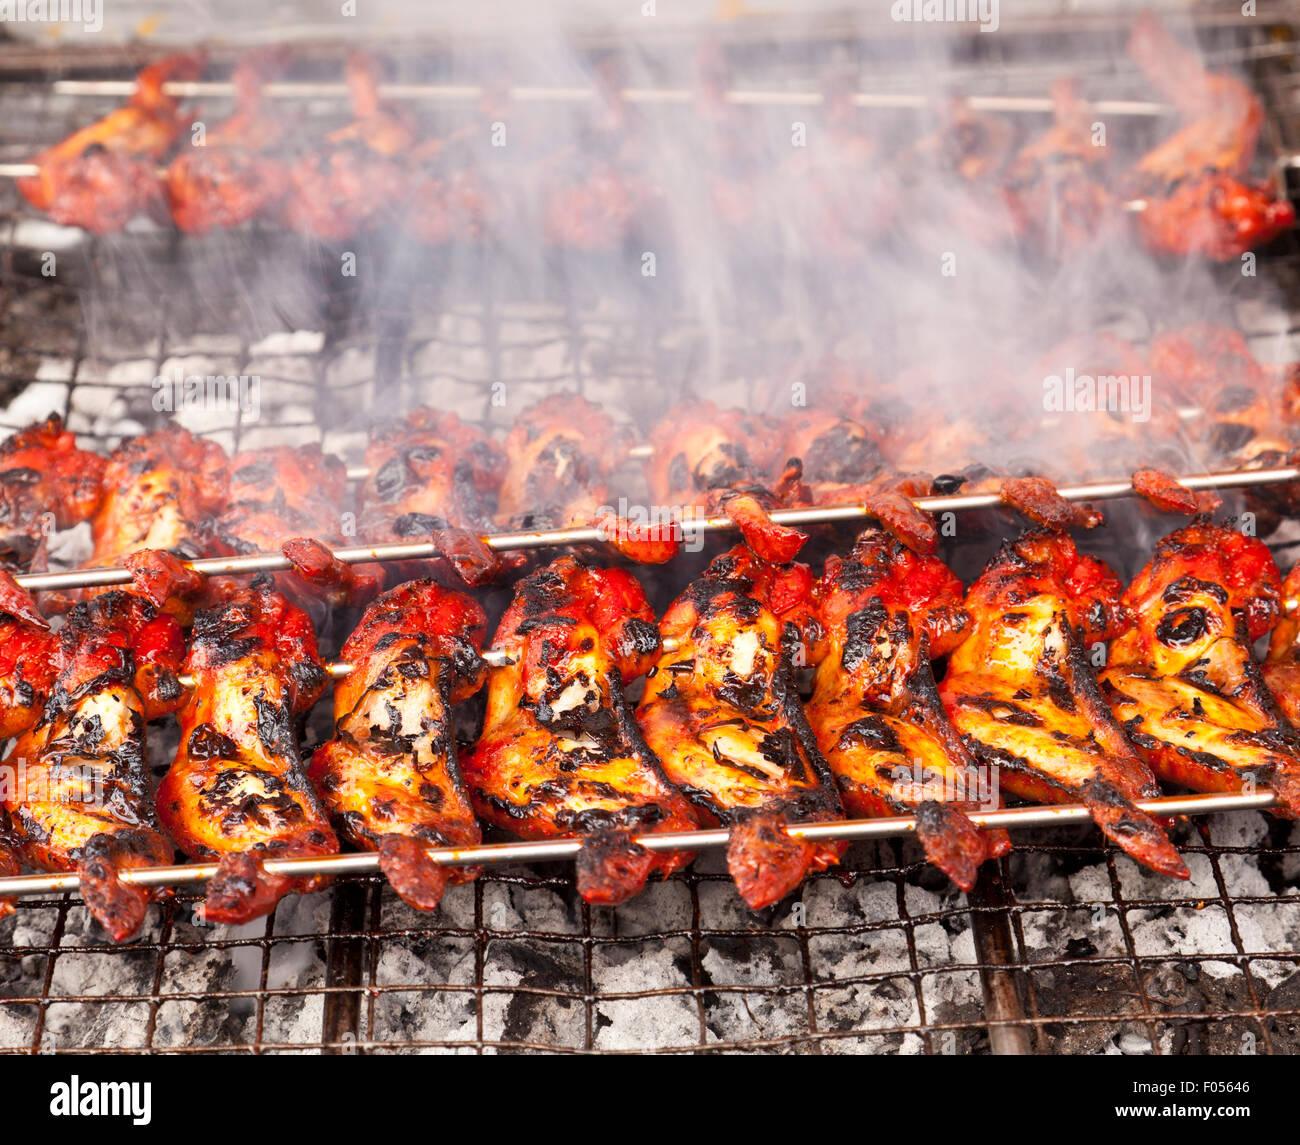 Ailes de poulet barbecue Photo Stock